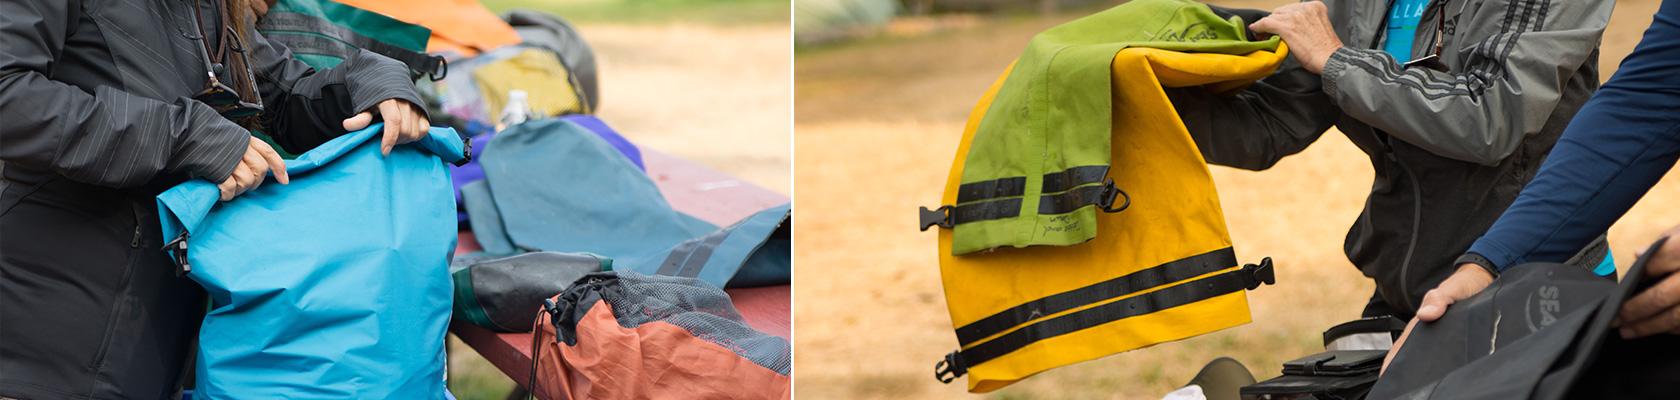 Packing Bags for kayaking